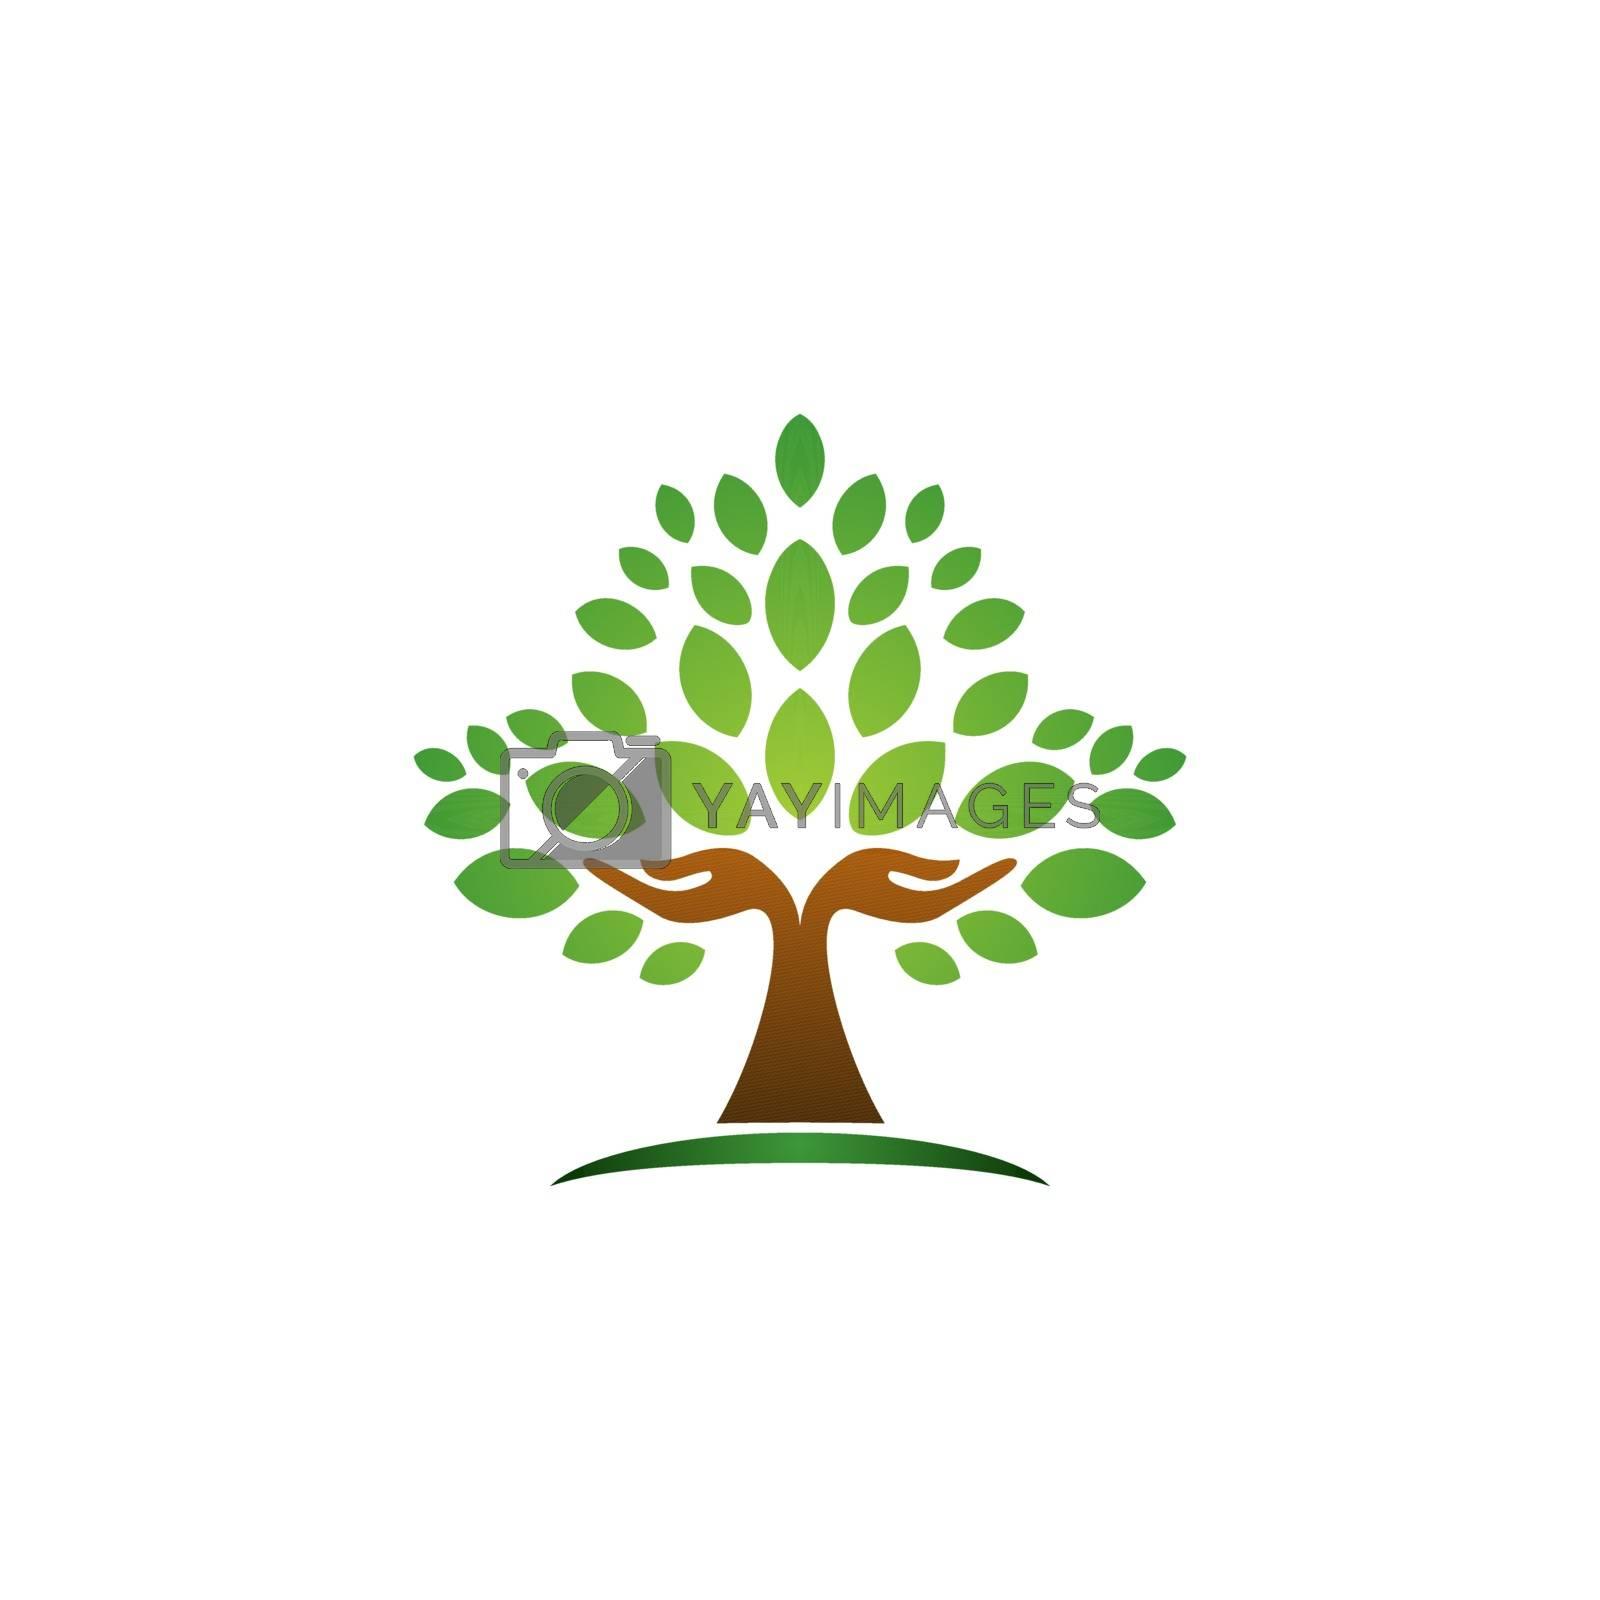 hand tree logo concept nature wellness health symbol icon vector design illustration